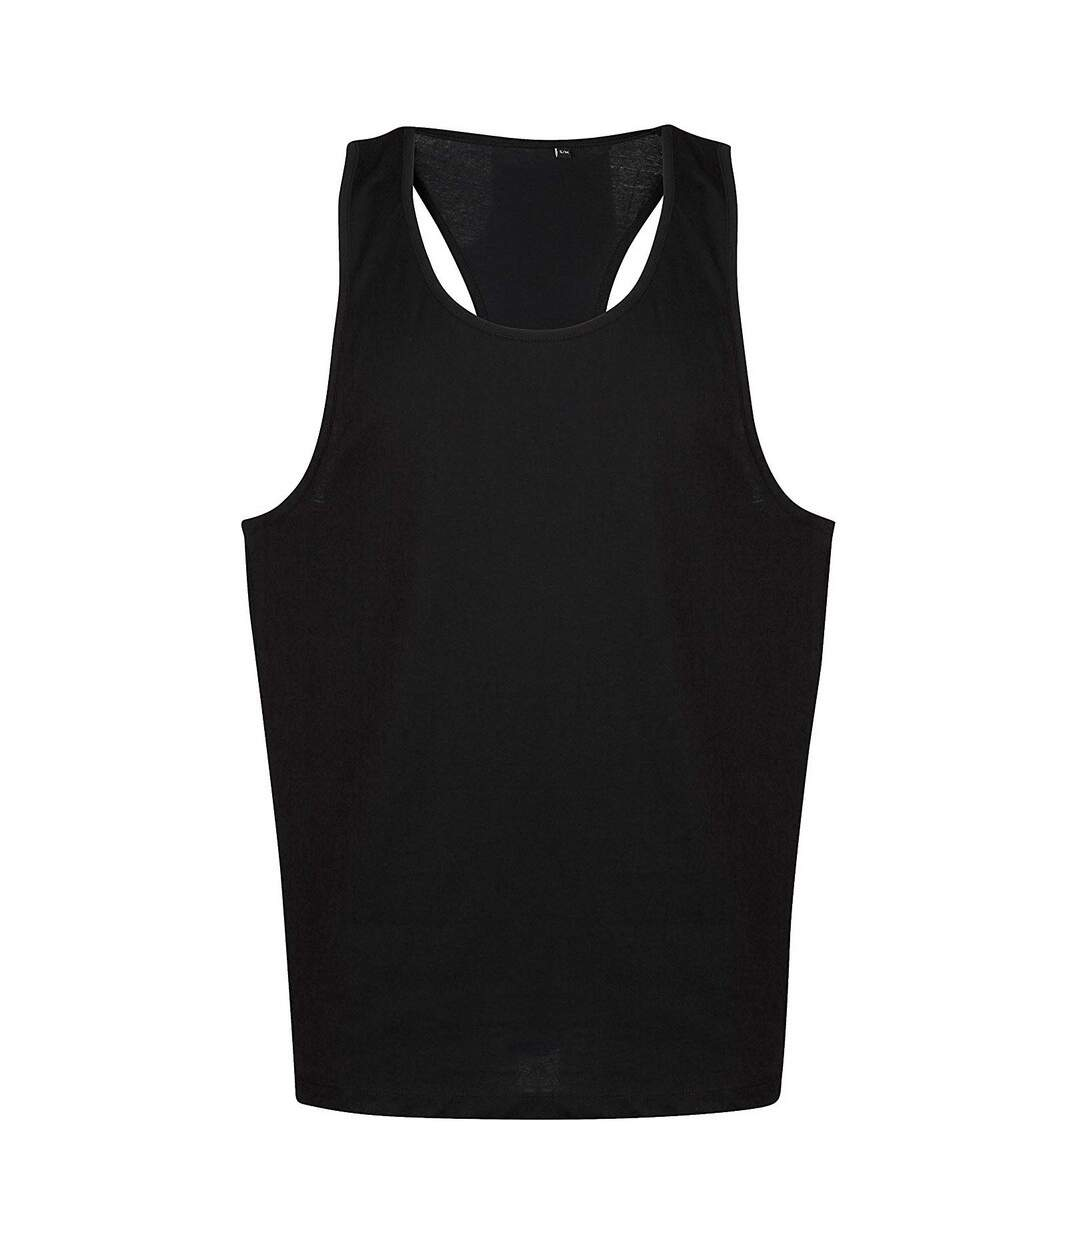 Tanx Mens Vest Sleeveless Vest Top / Muscle Vest (Black) - UTRW2869